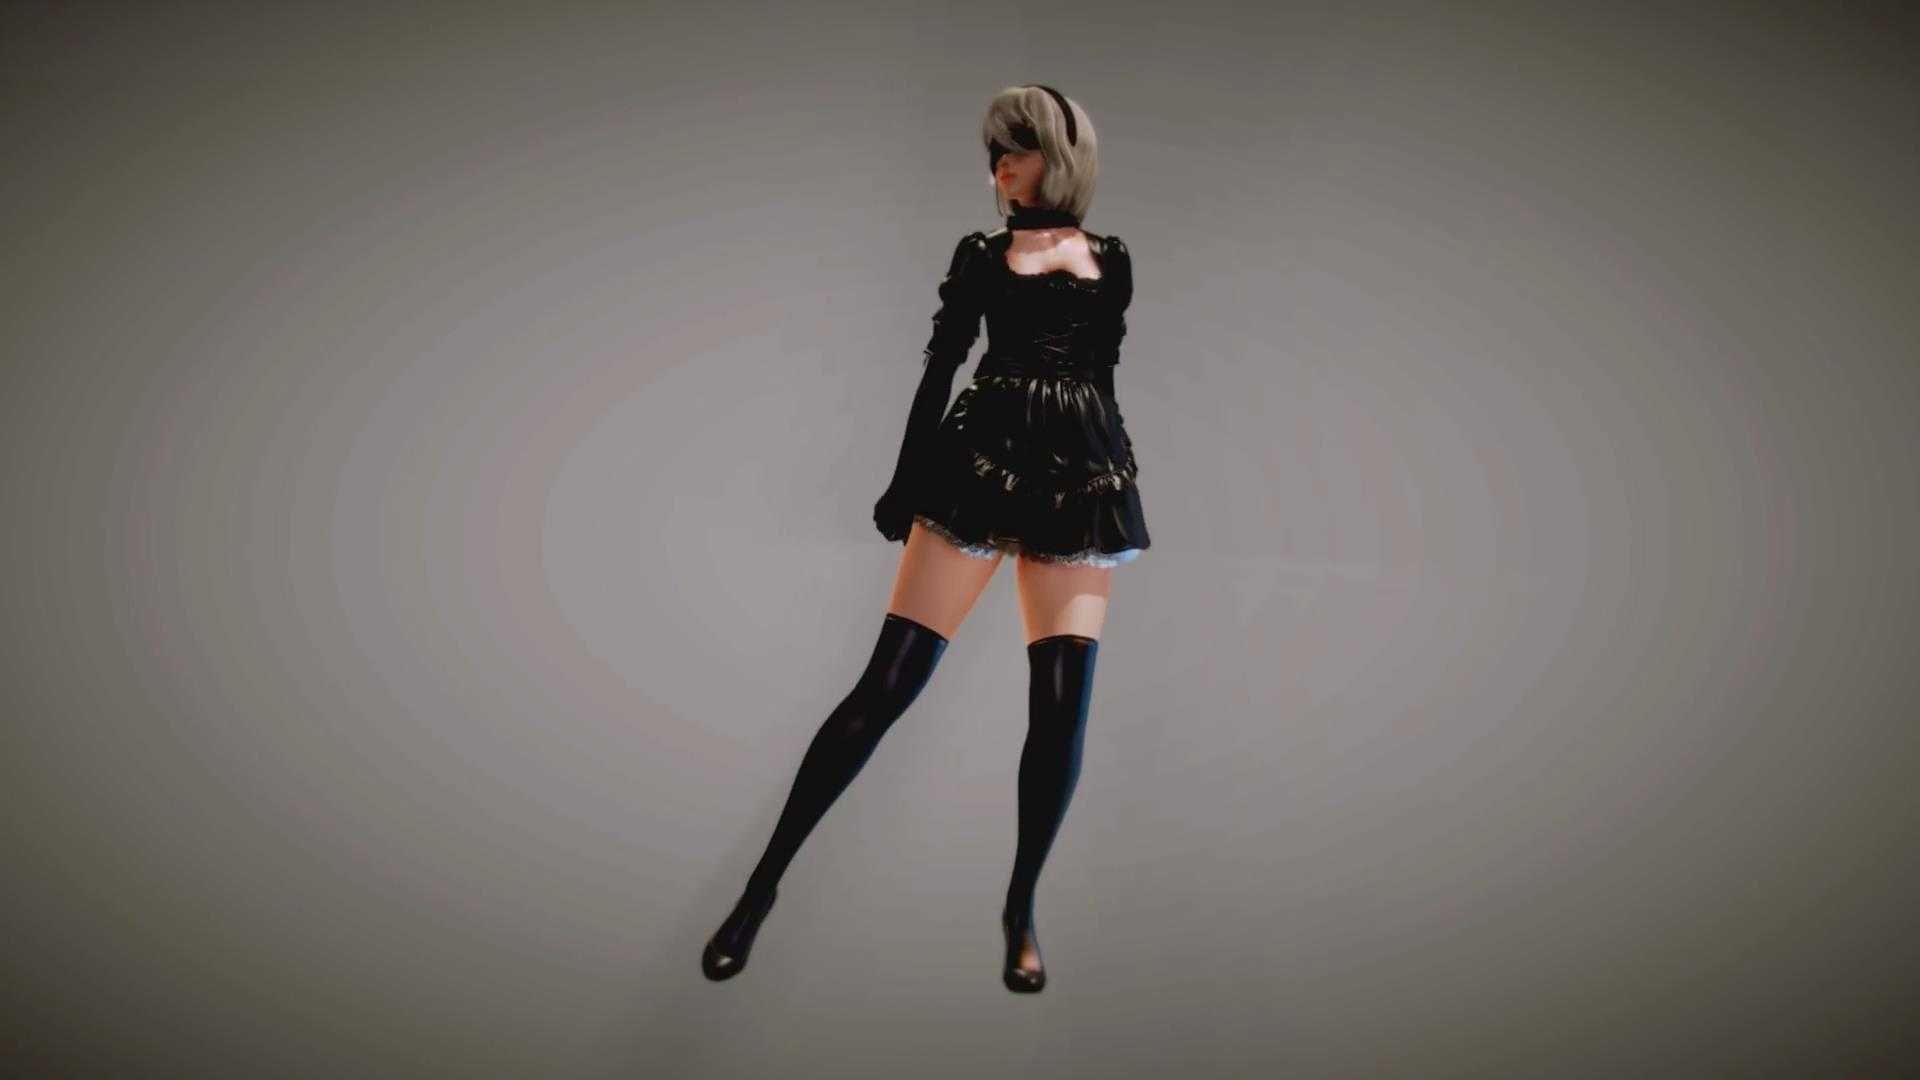 【尼尔:机械纪元 MMD】2B DANCE